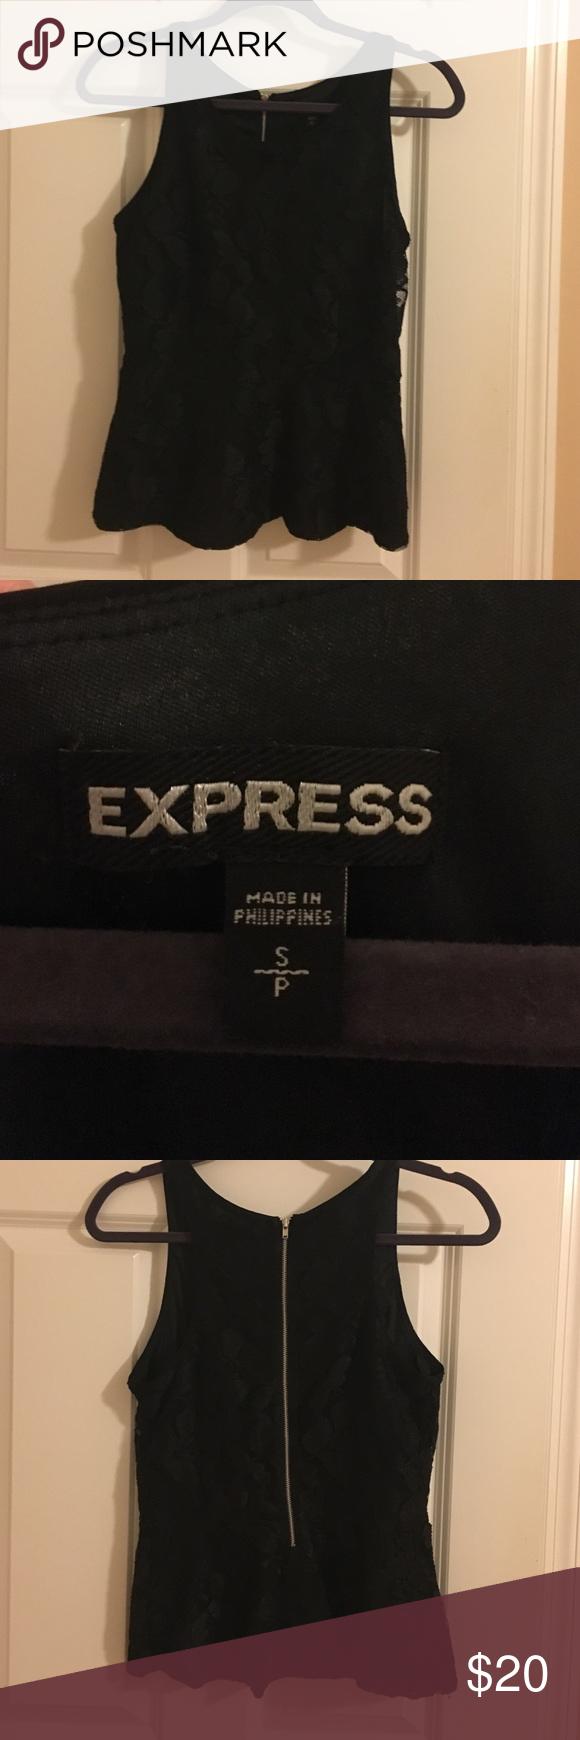 Express Black Lace Peplum top- size small Express black lace peplum top- size small, exposed silver back zipper! Express Tops Blouses